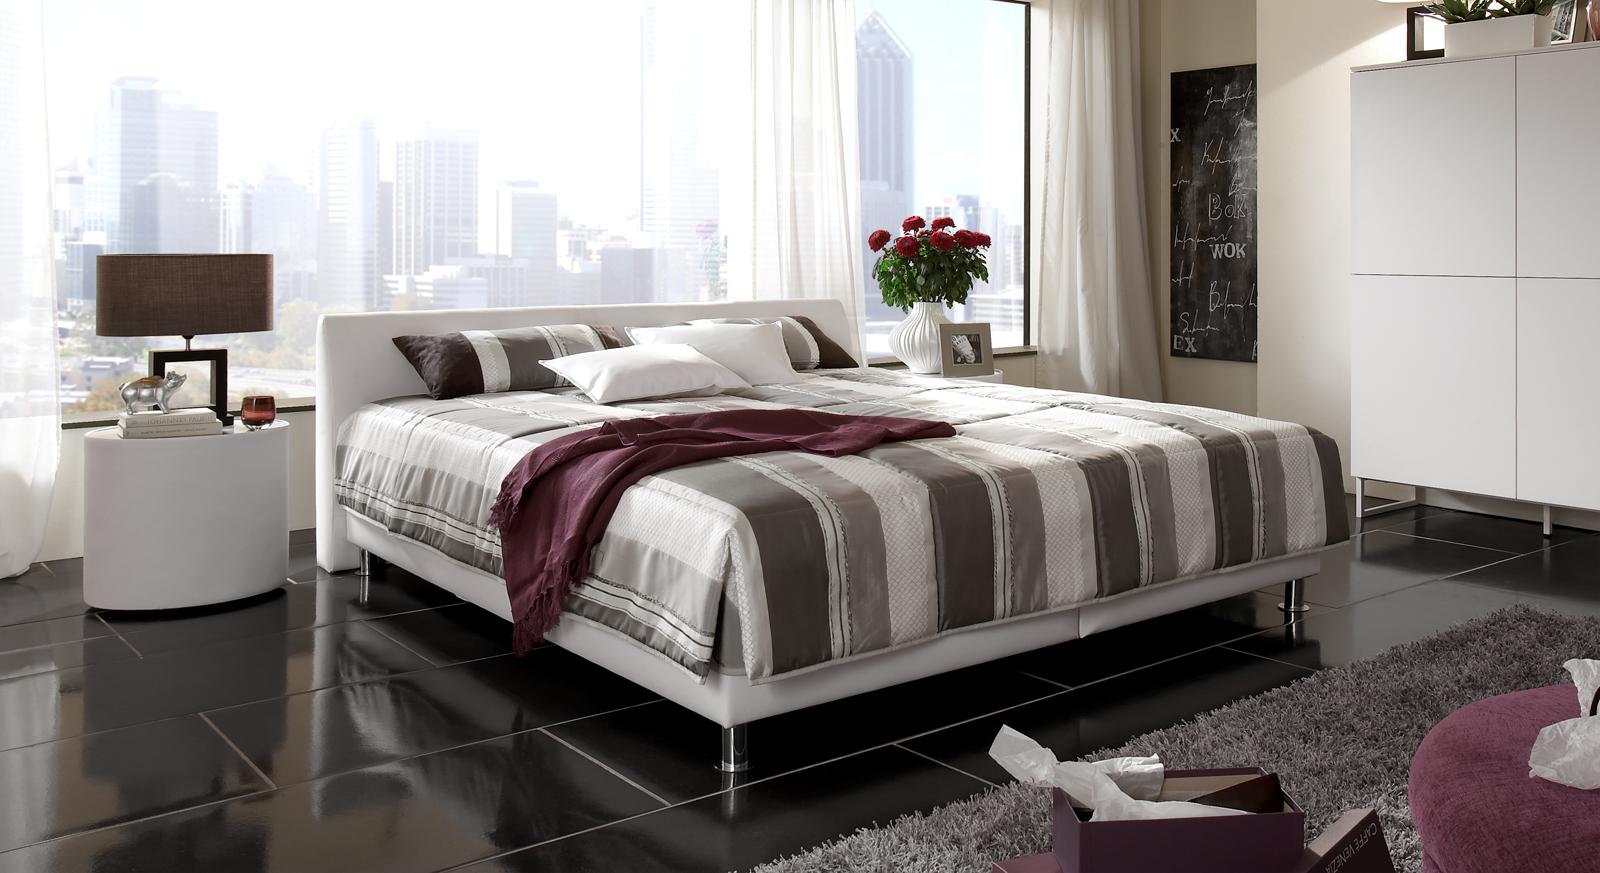 modernes polsterbett aus leder mit bettkasten liberio. Black Bedroom Furniture Sets. Home Design Ideas